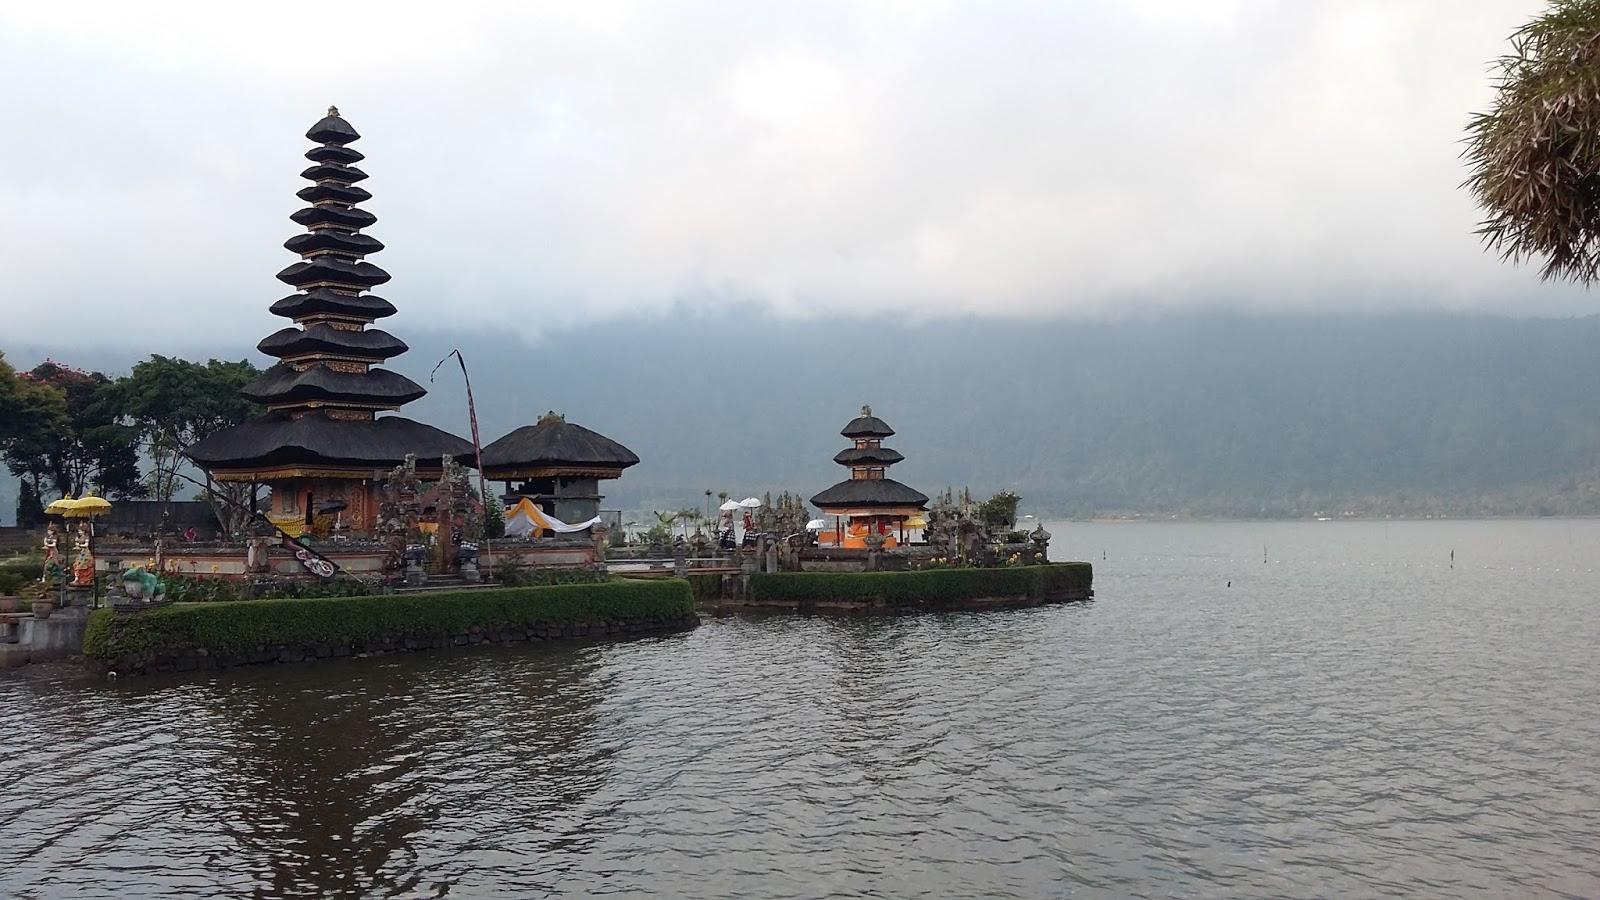 Pilihan Objek Wisata Yang Dingin Dan Adem Di Bali